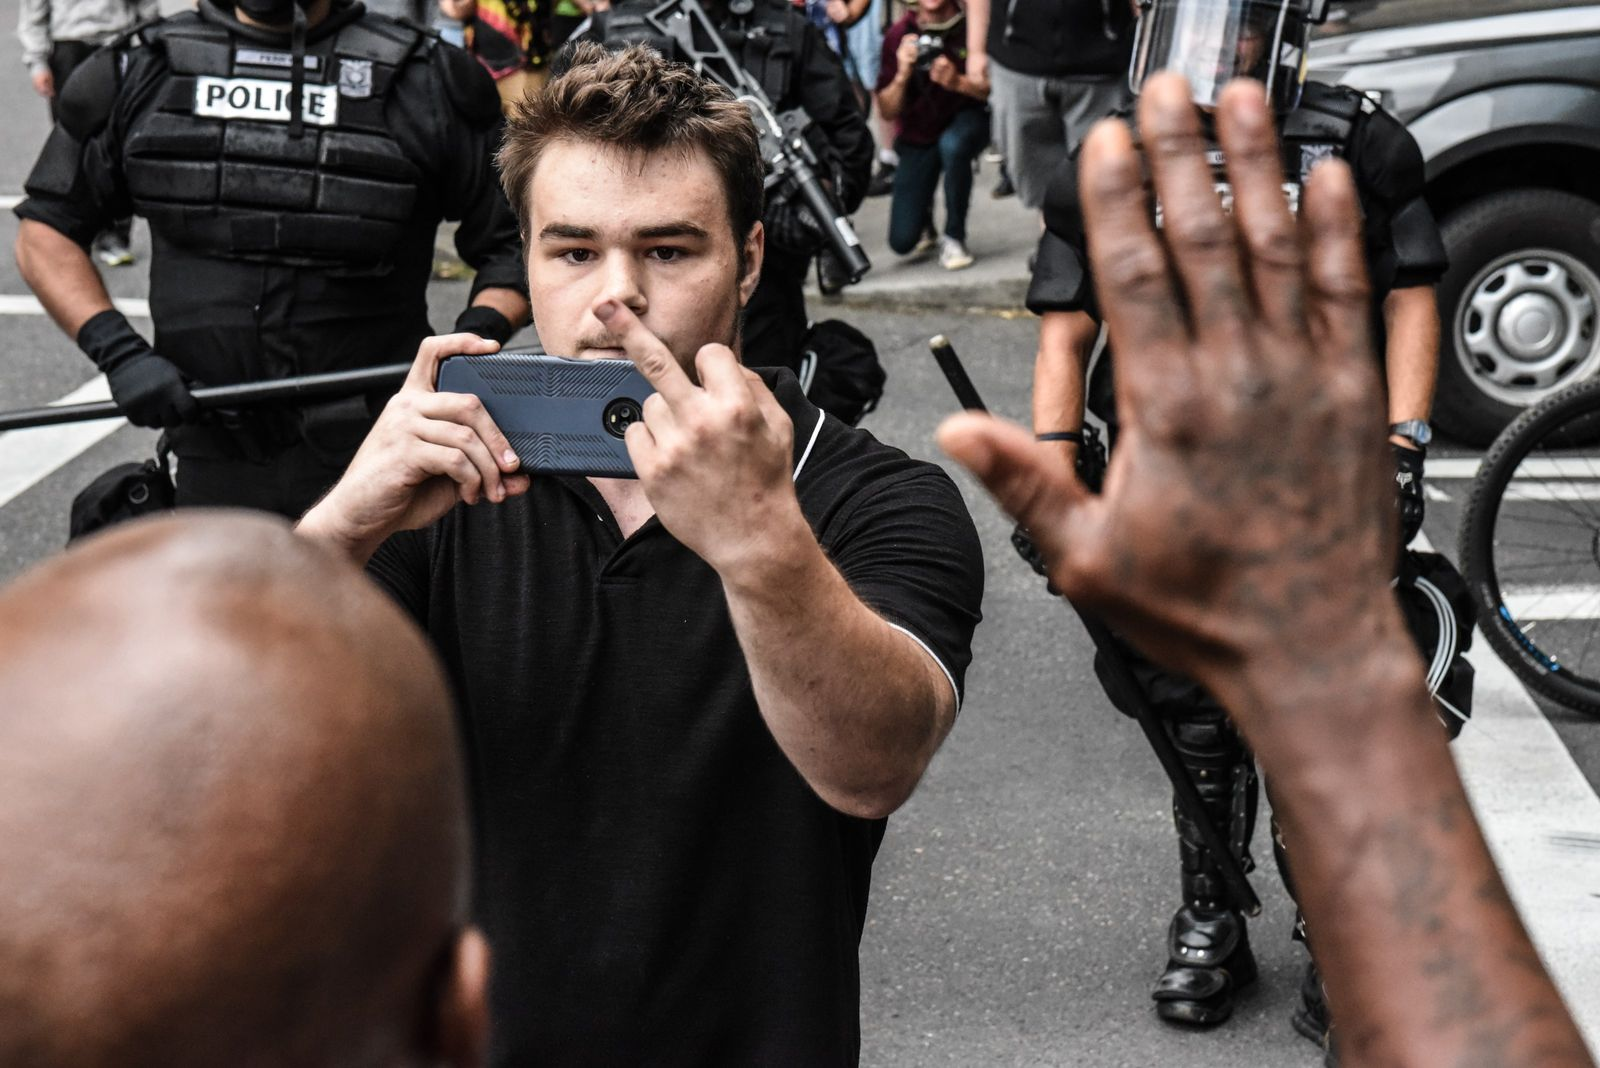 POrtland Nazi Demo Protest Gegenprotest Antifa